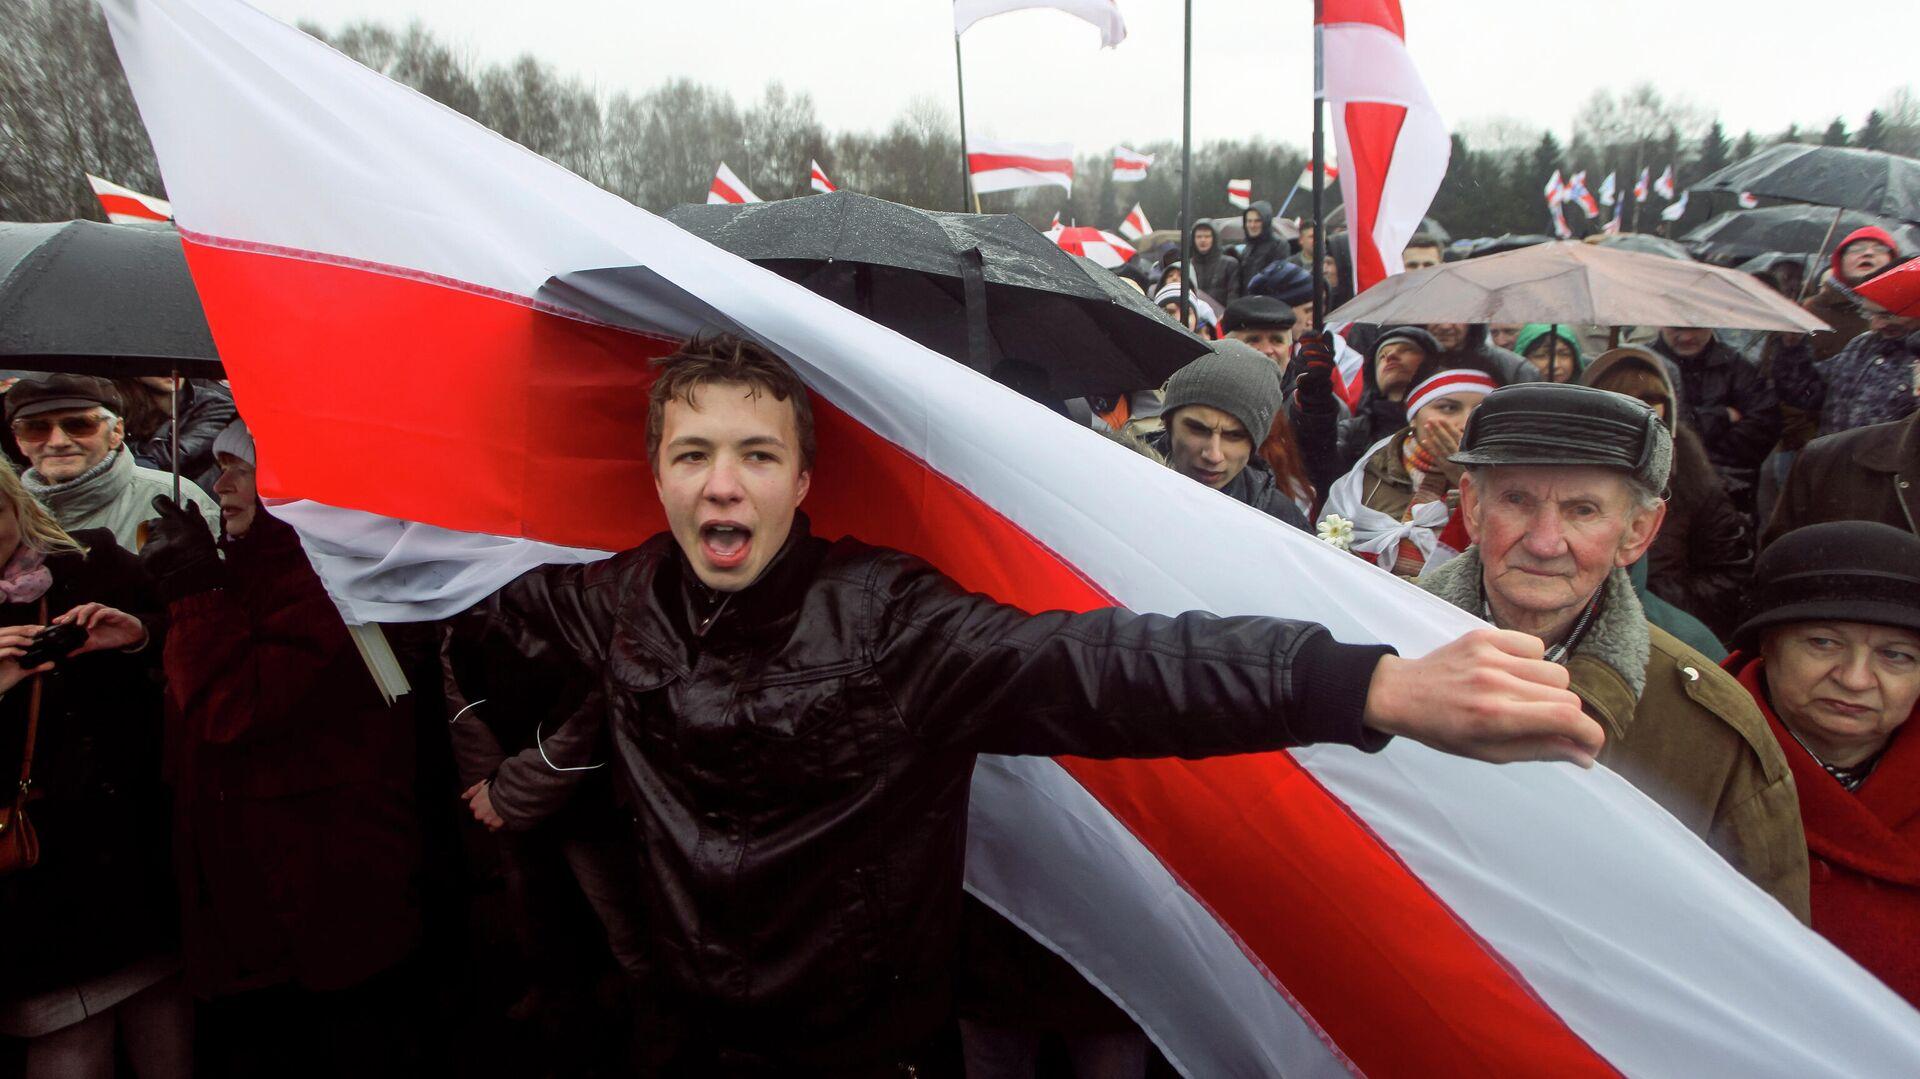 Активист Роман Протасевич во время акции протеста в Минске - РИА Новости, 1920, 04.06.2021